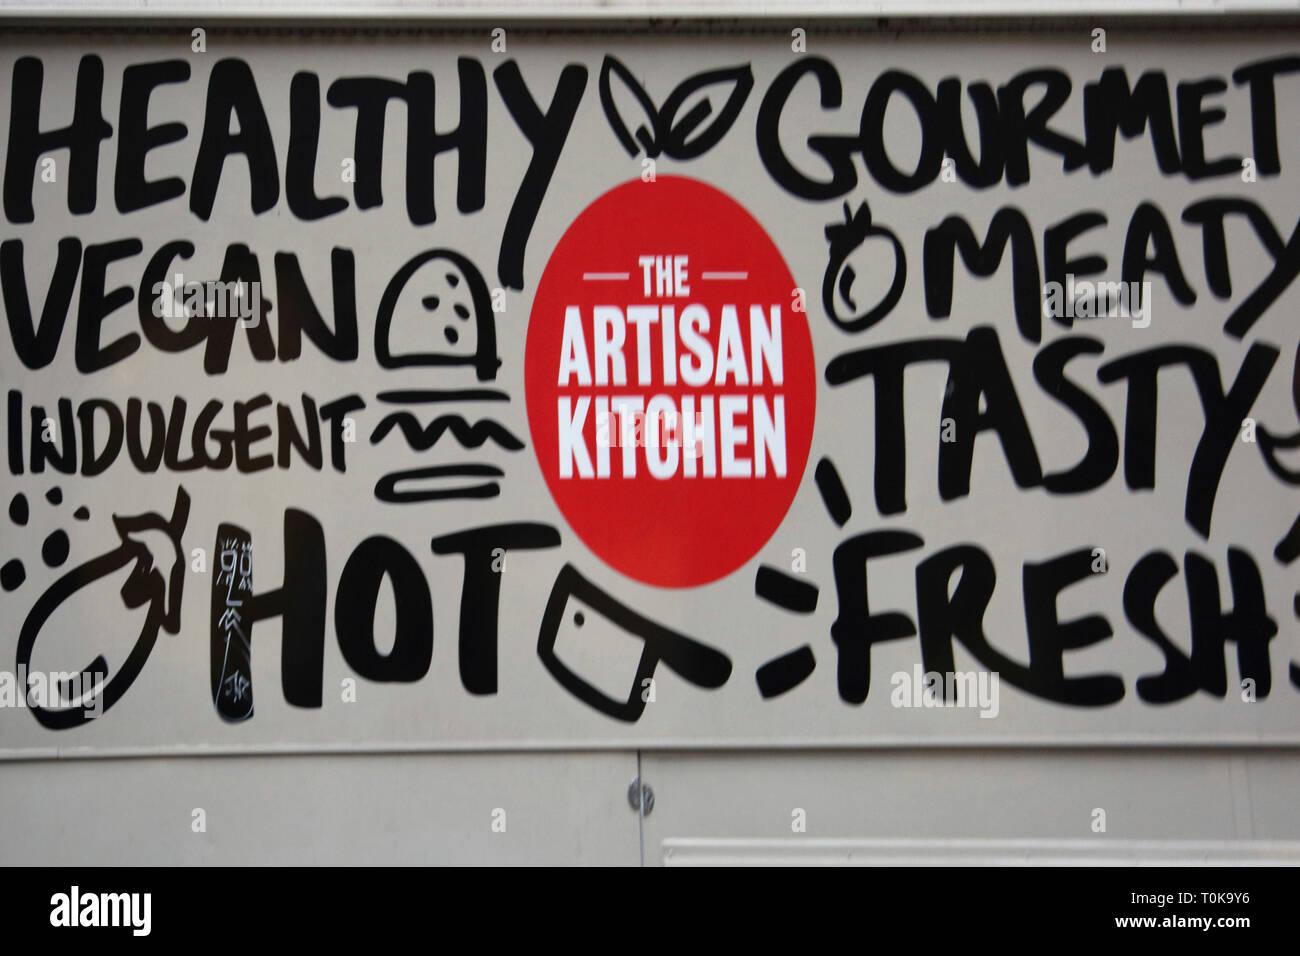 Southwark London England The Artisan Kitchen Van Selling Vegan Gourmet Food Outside Guy's Hospital - Stock Image